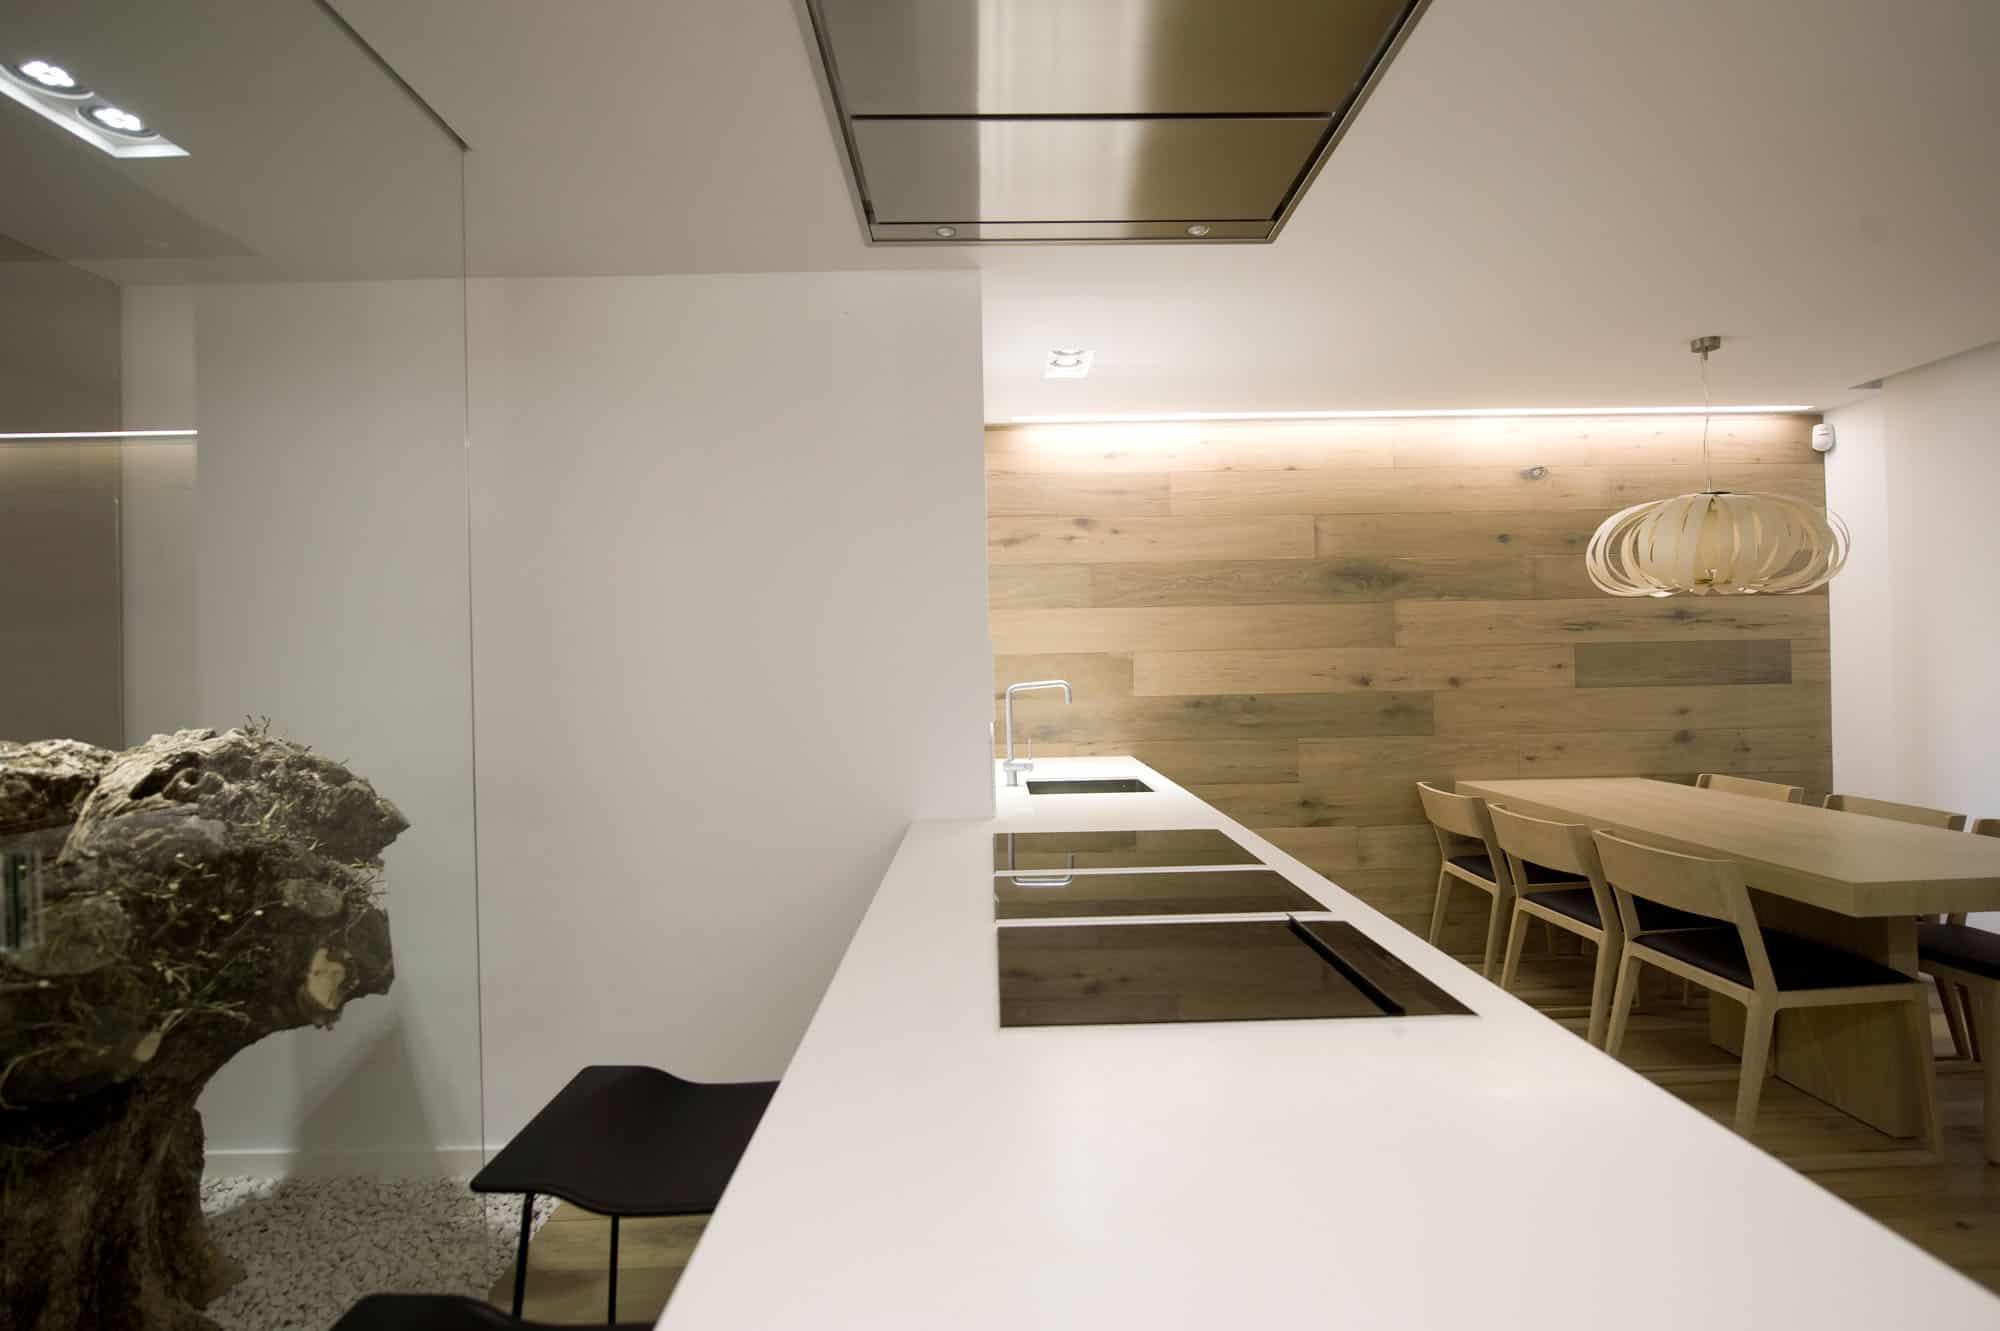 HI-MACS Doble Dueto Apartment by Cuartopensante (13)